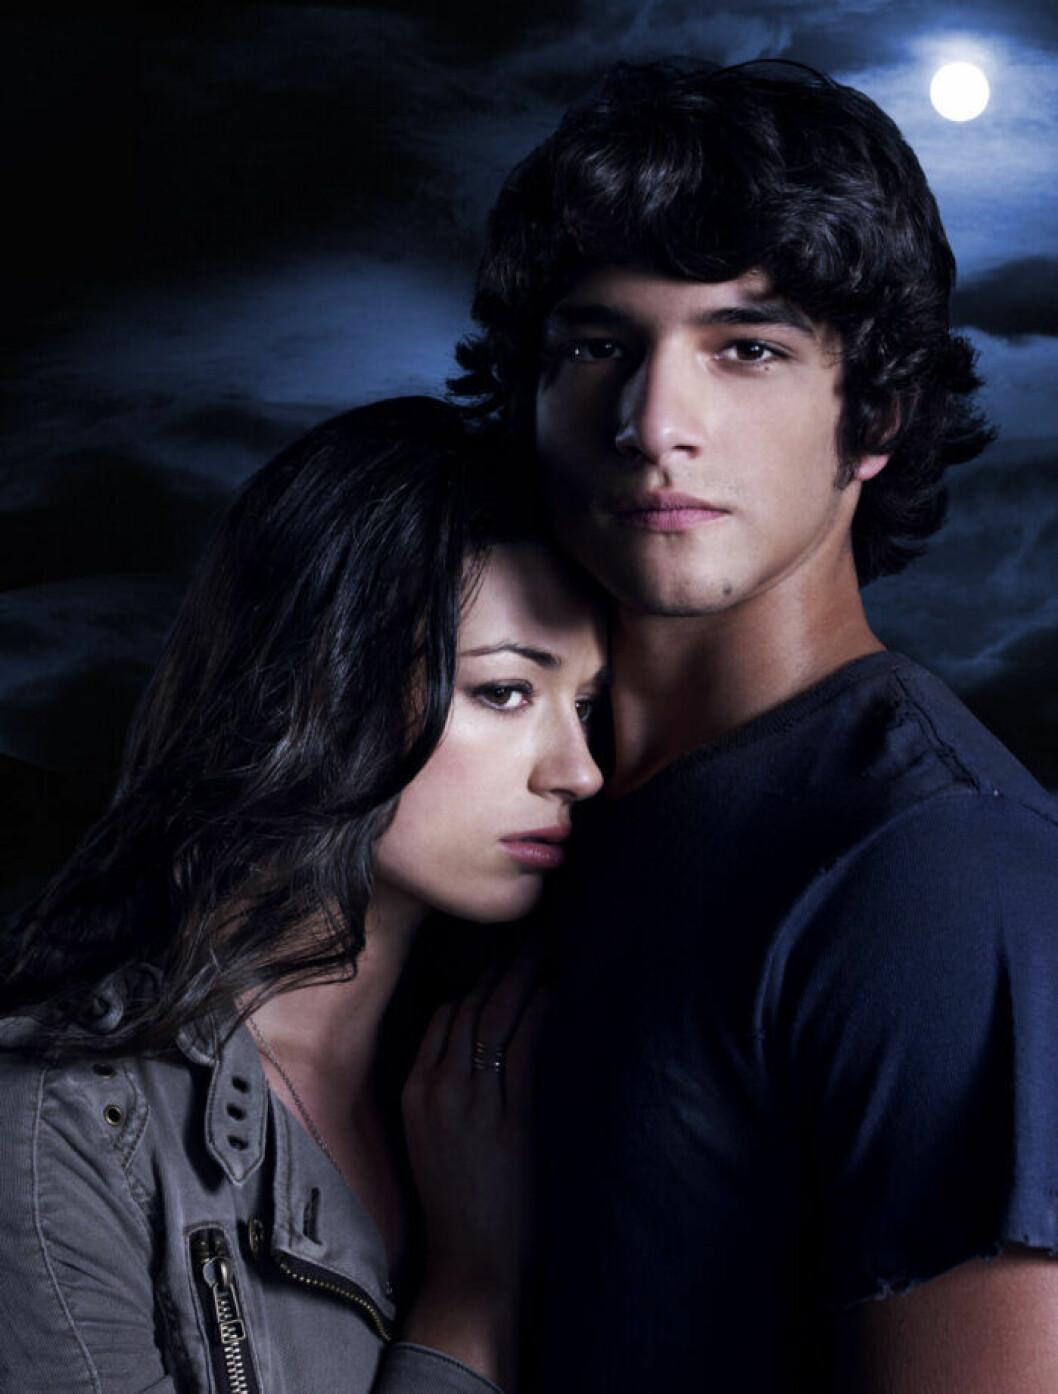 Teen Wolf - 2011